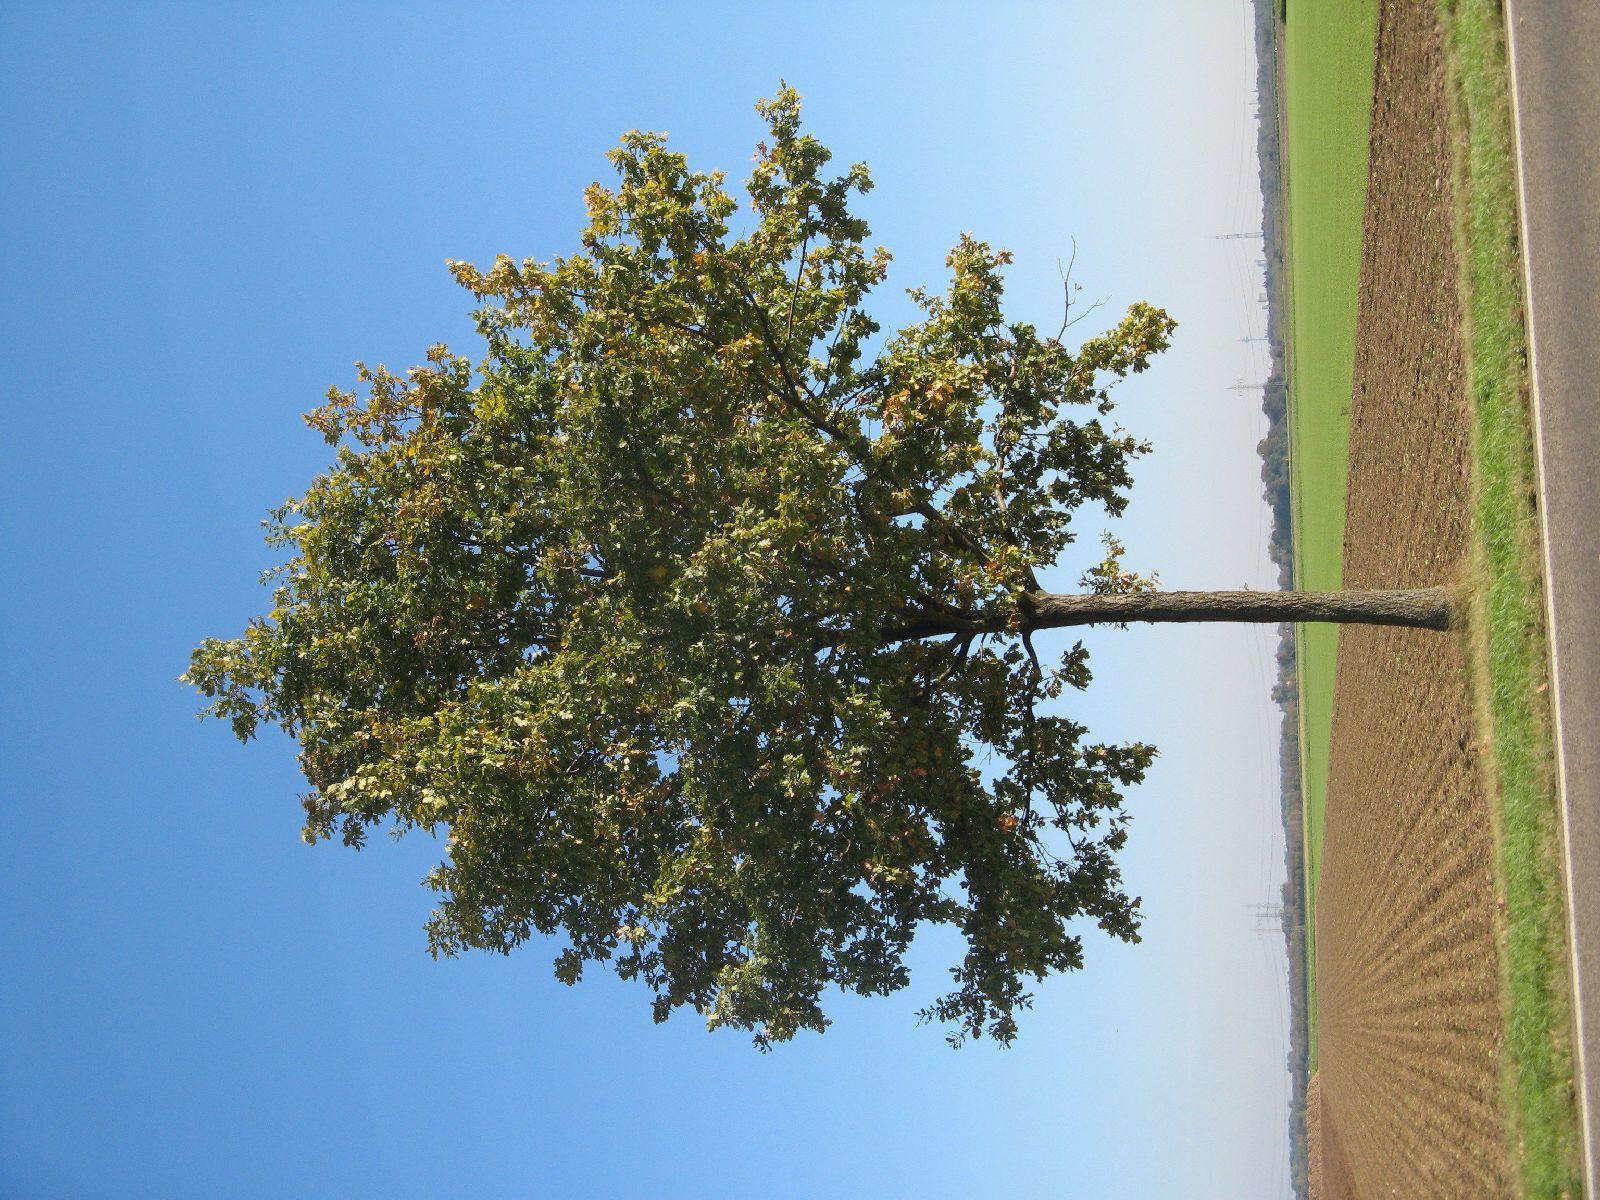 Plants-Trees_Photo_Texture_B_3748